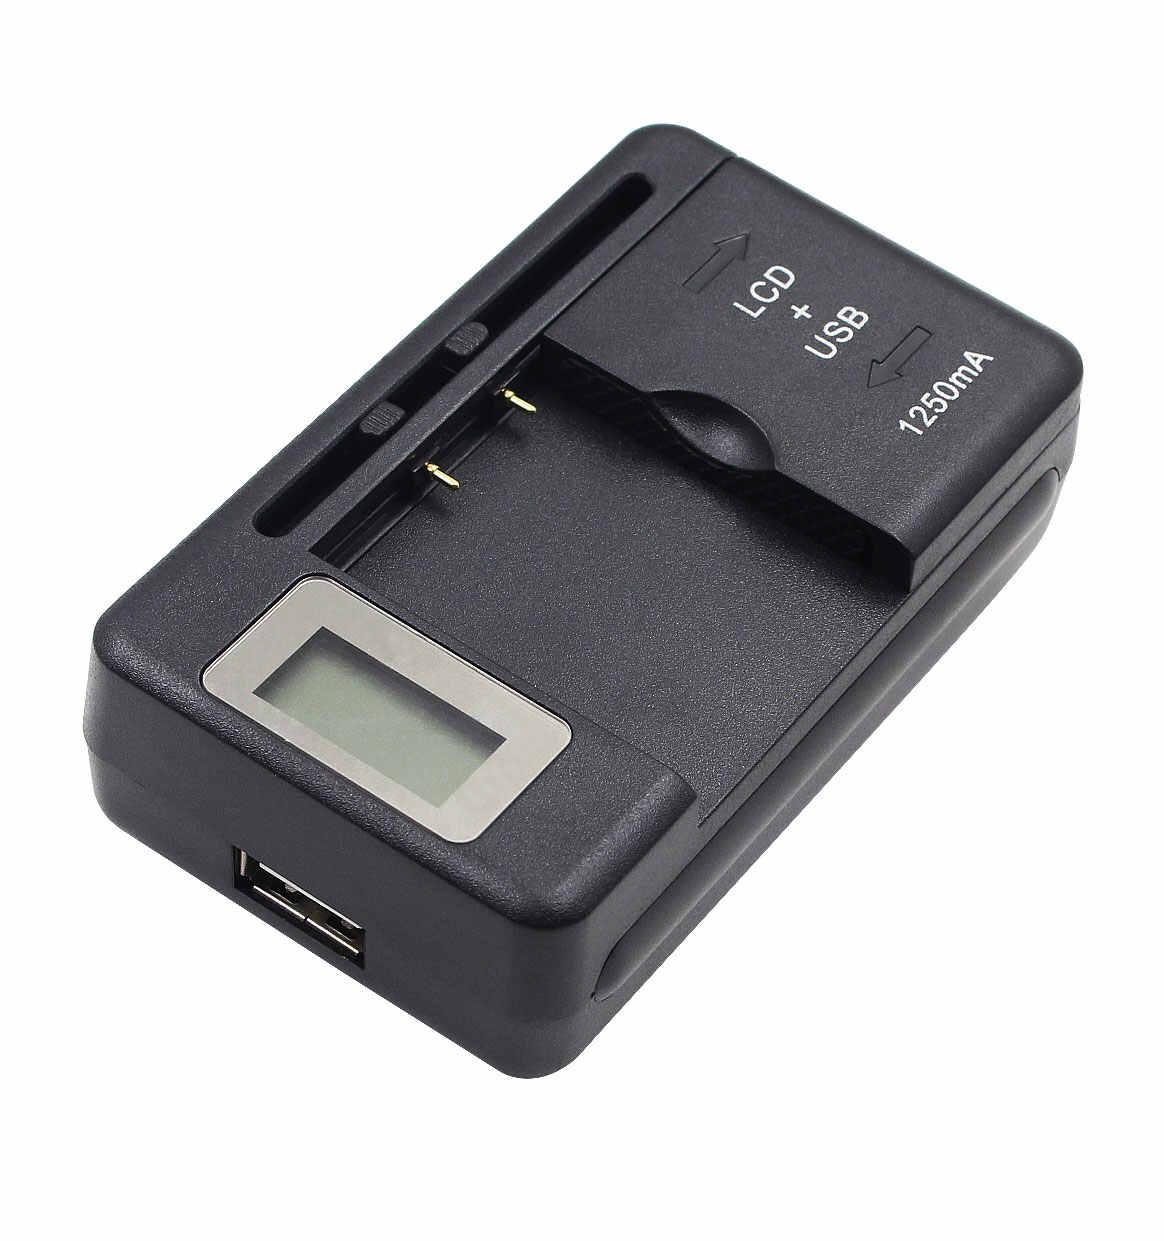 США AC/DC Мощность адаптер Зарядник для LG BL-41A1HB мобильный LS676 X Стиль L56VL BL-41A1H дань LS 660 Батарея